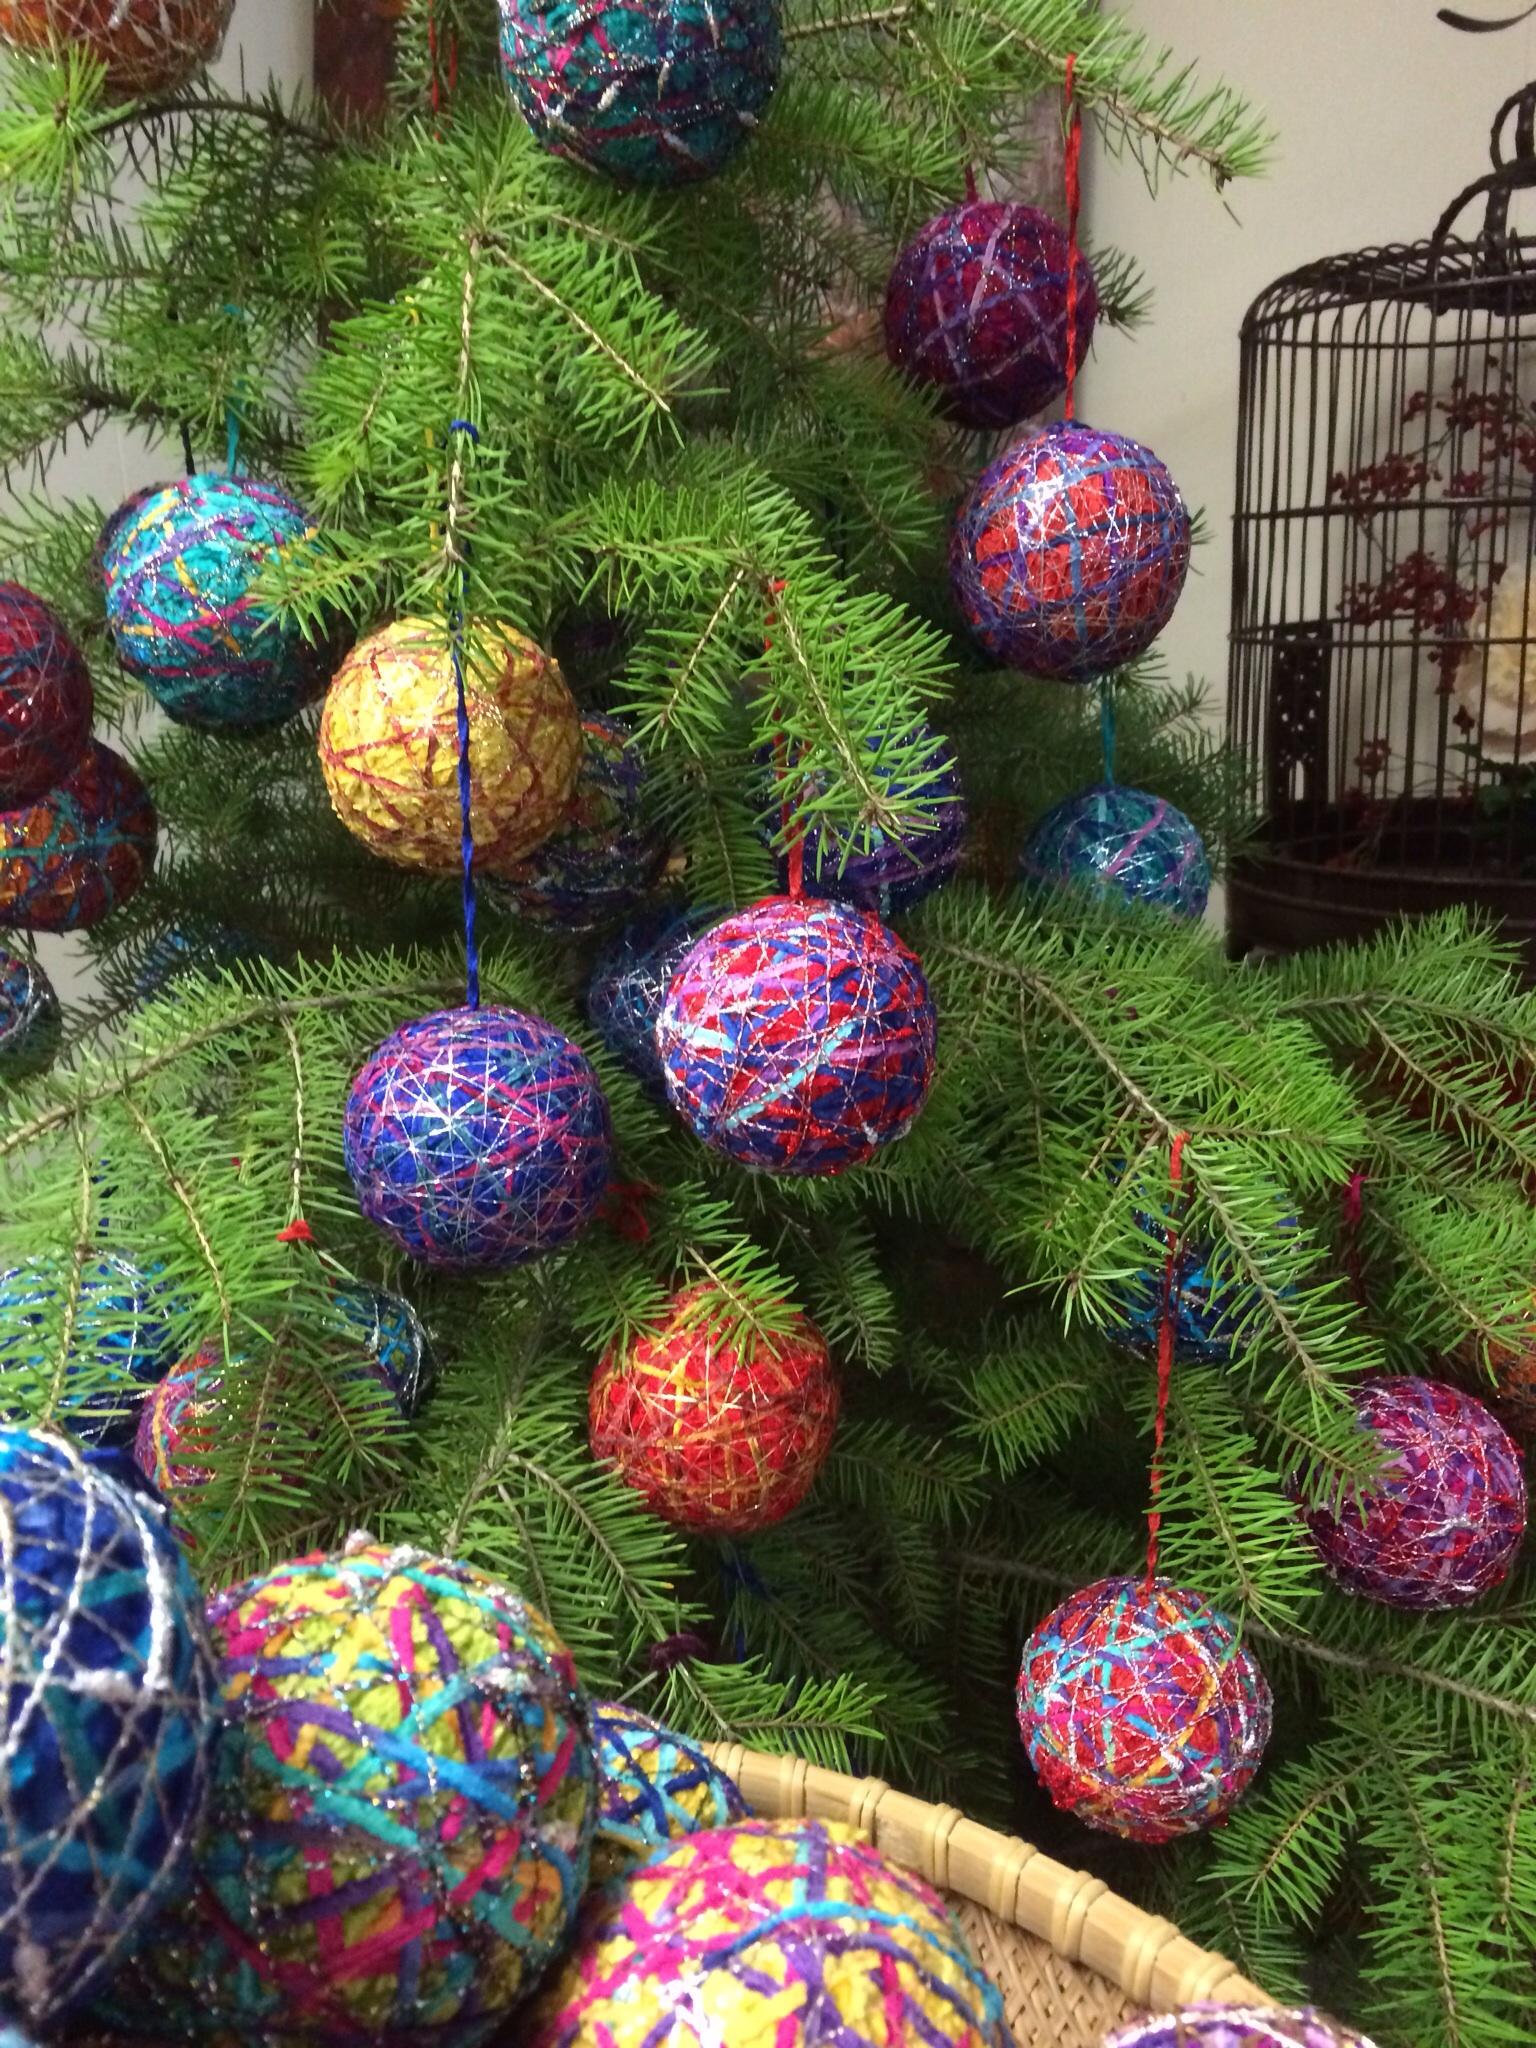 Bonnie Tarses's ornaments